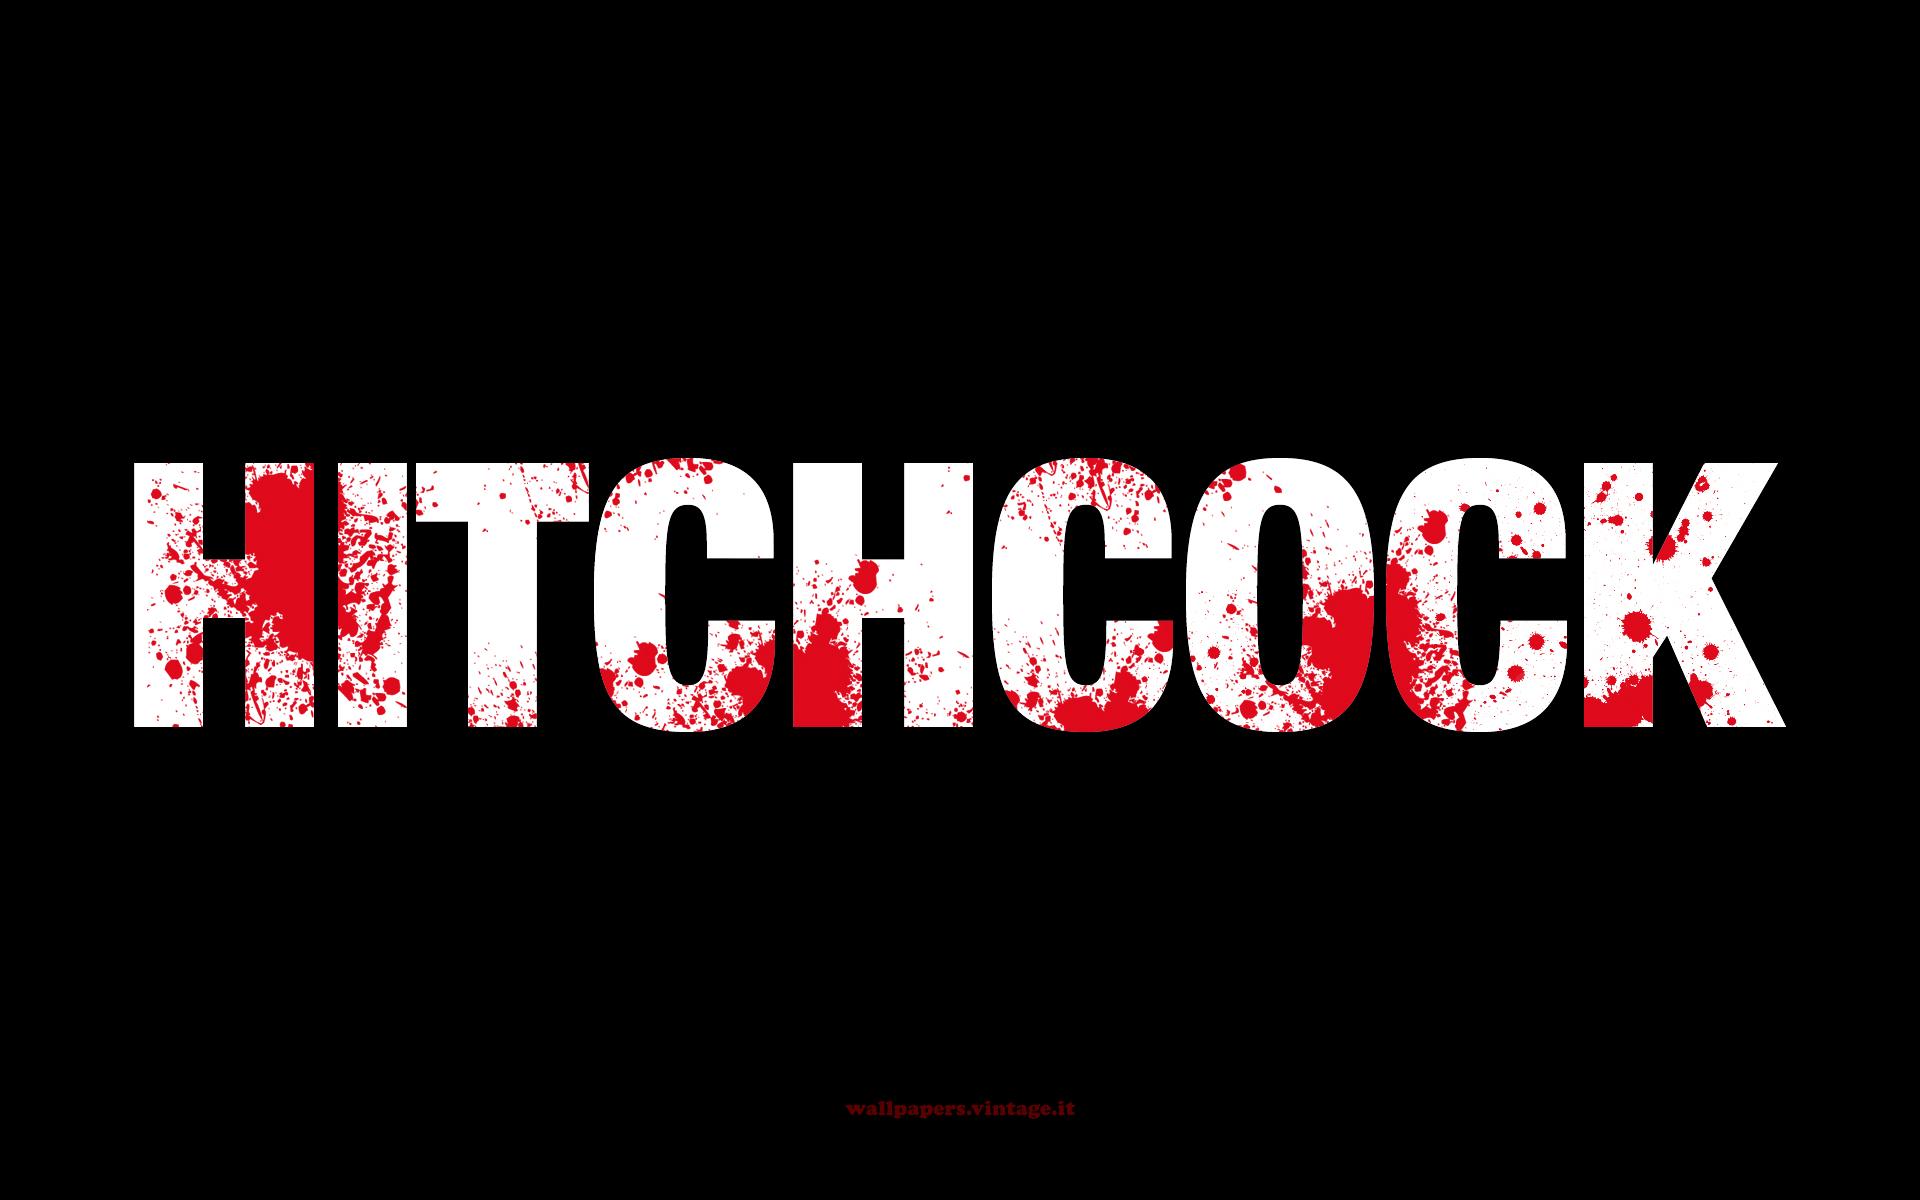 Alfred Hitchcock - Psycho wallpaper - Free Desktop HD iPad iPhone